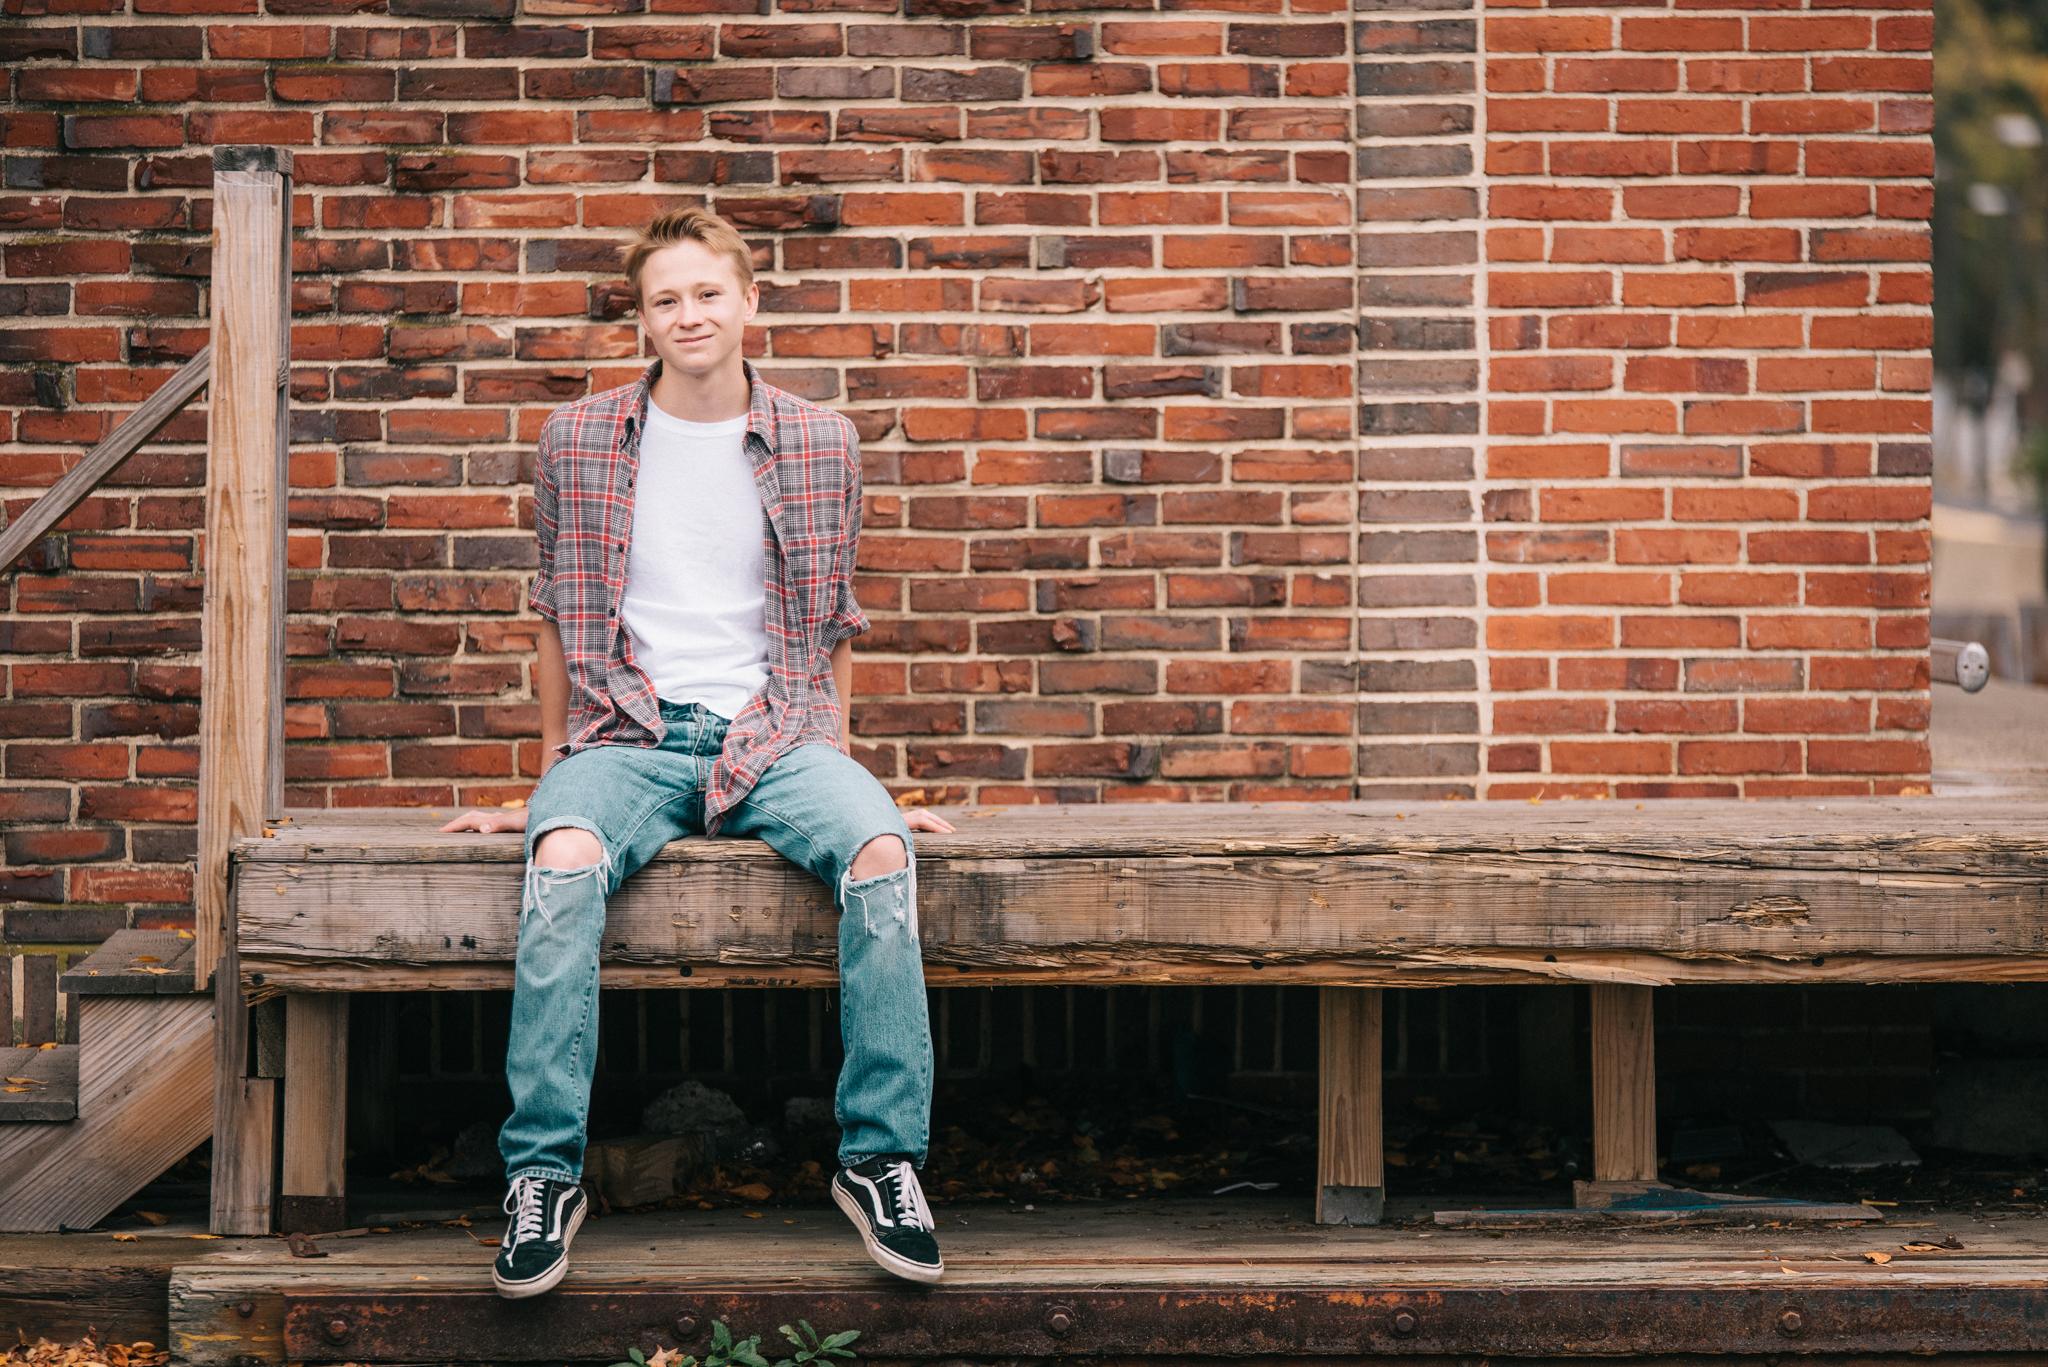 Senior_portraits_JaredZaval_Manchester_LOJP2017_14.jpg